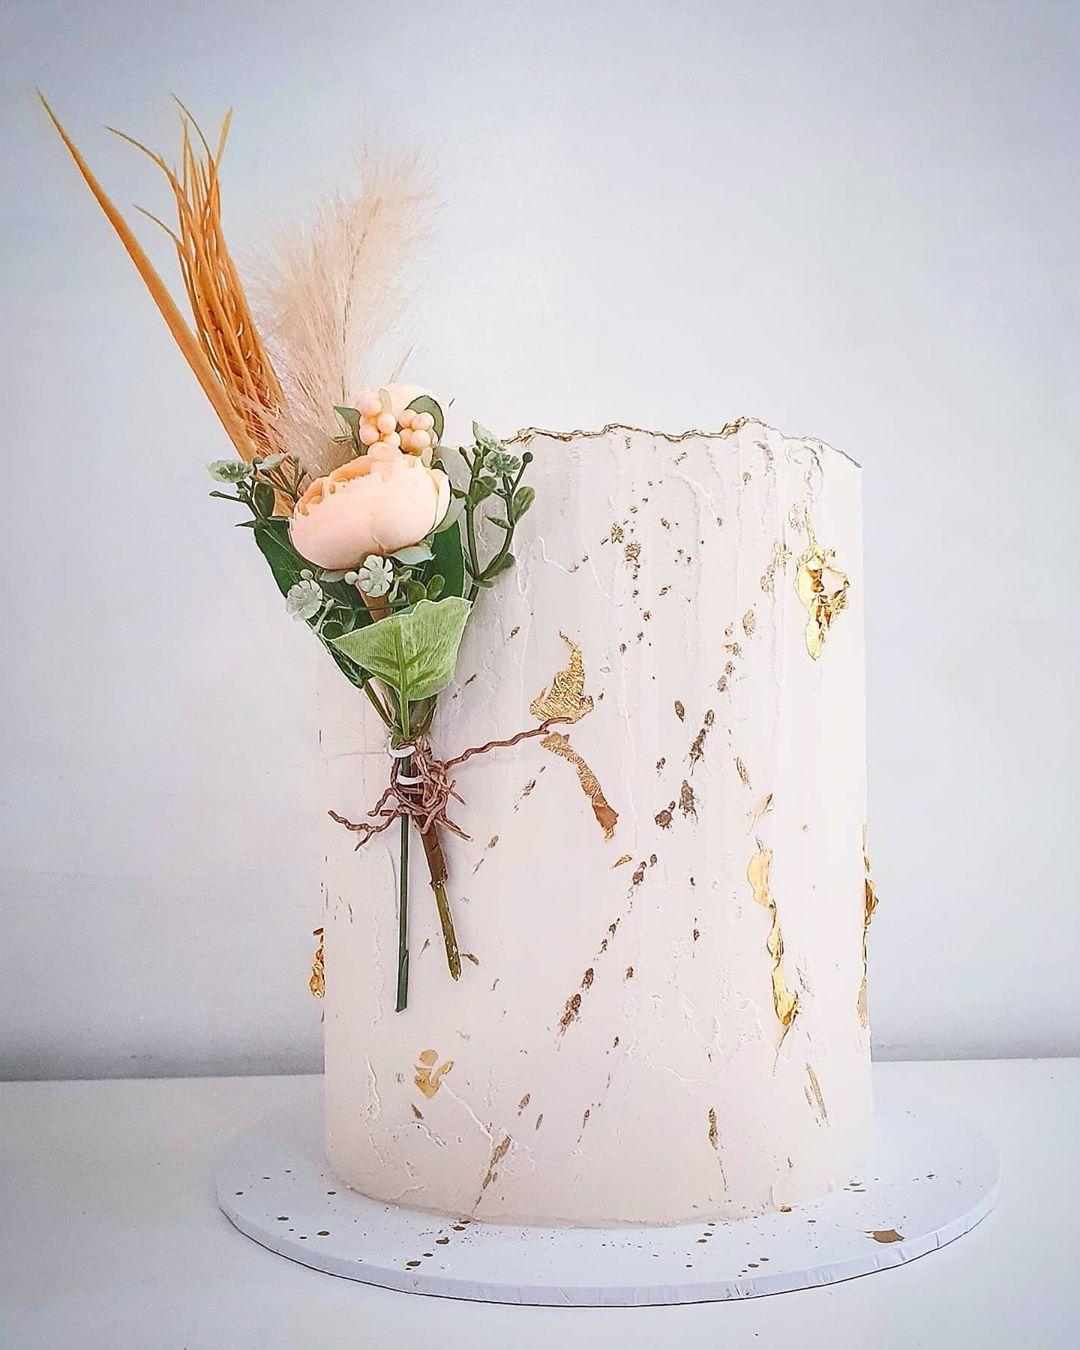 "C A K E S B Y H A N A N on Instagram: ""💗💗💗 . . . #cake_me_pretty #instalove #instadaily #instalike #instagramhub #igers #sweet16 #food #instamood #instago #cakes #foodie #cake…"""